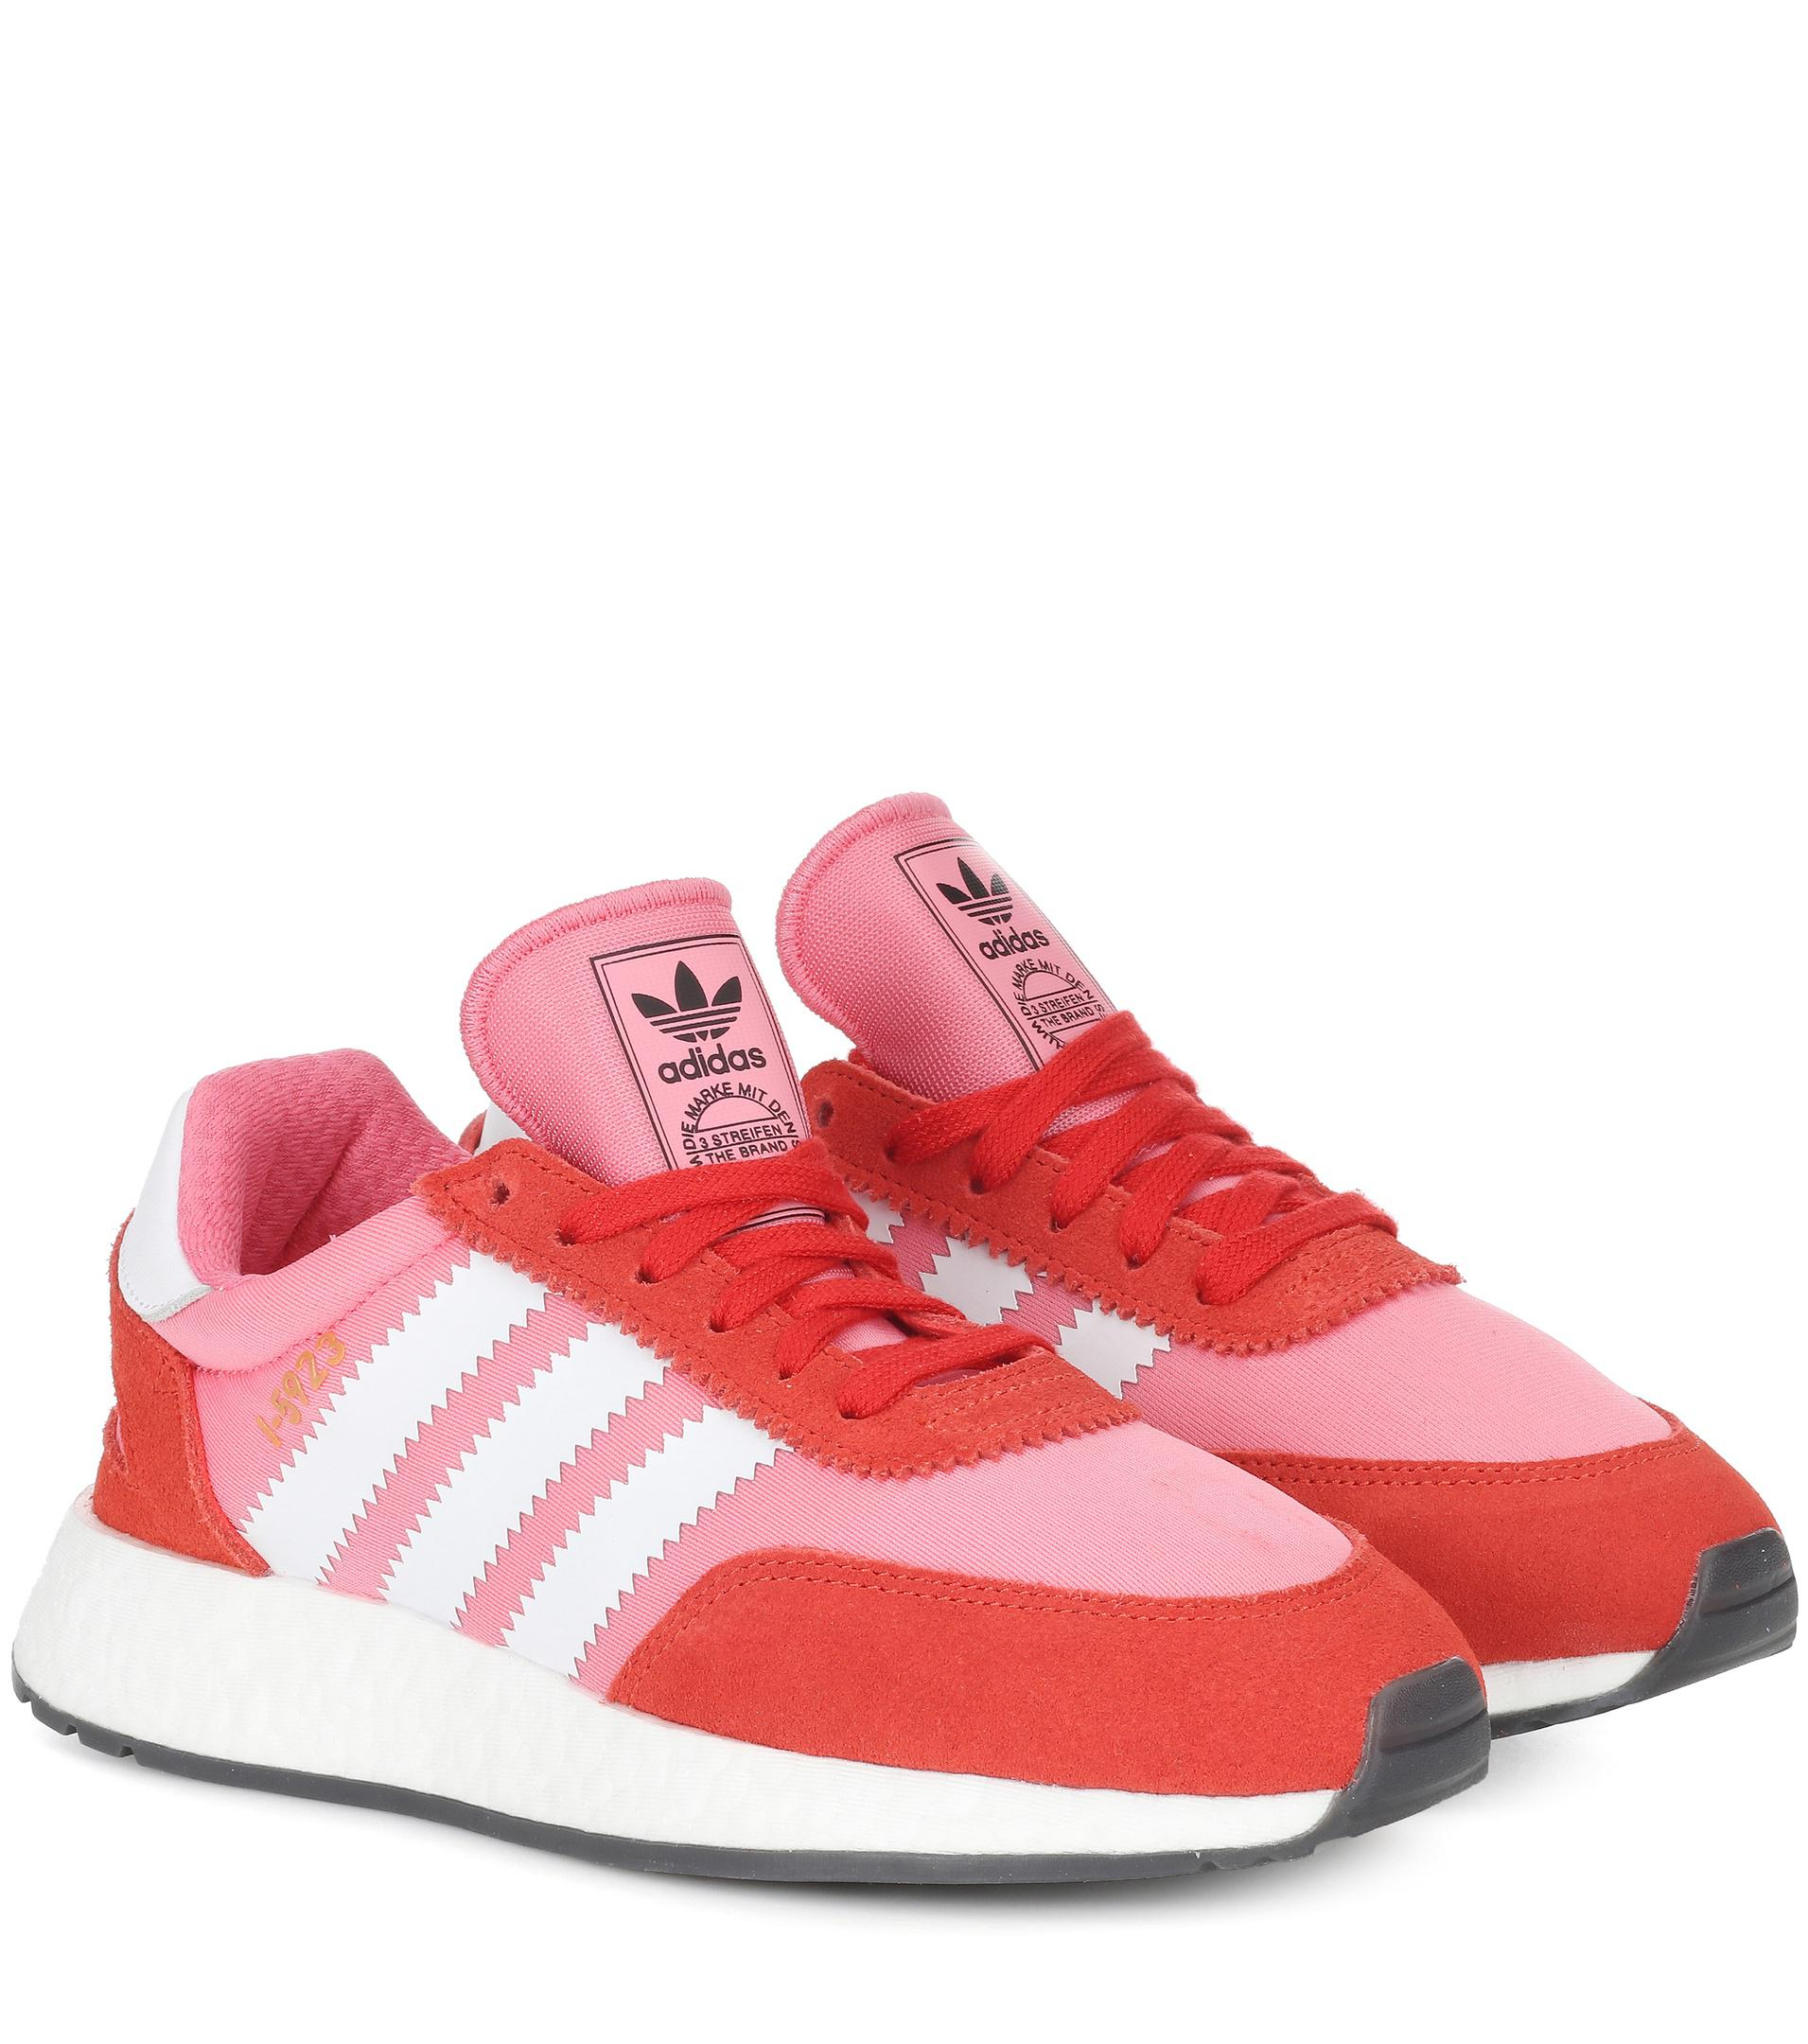 8fd1ed42b Lyst - adidas Originals Iniki Runner Sneakers in Pink